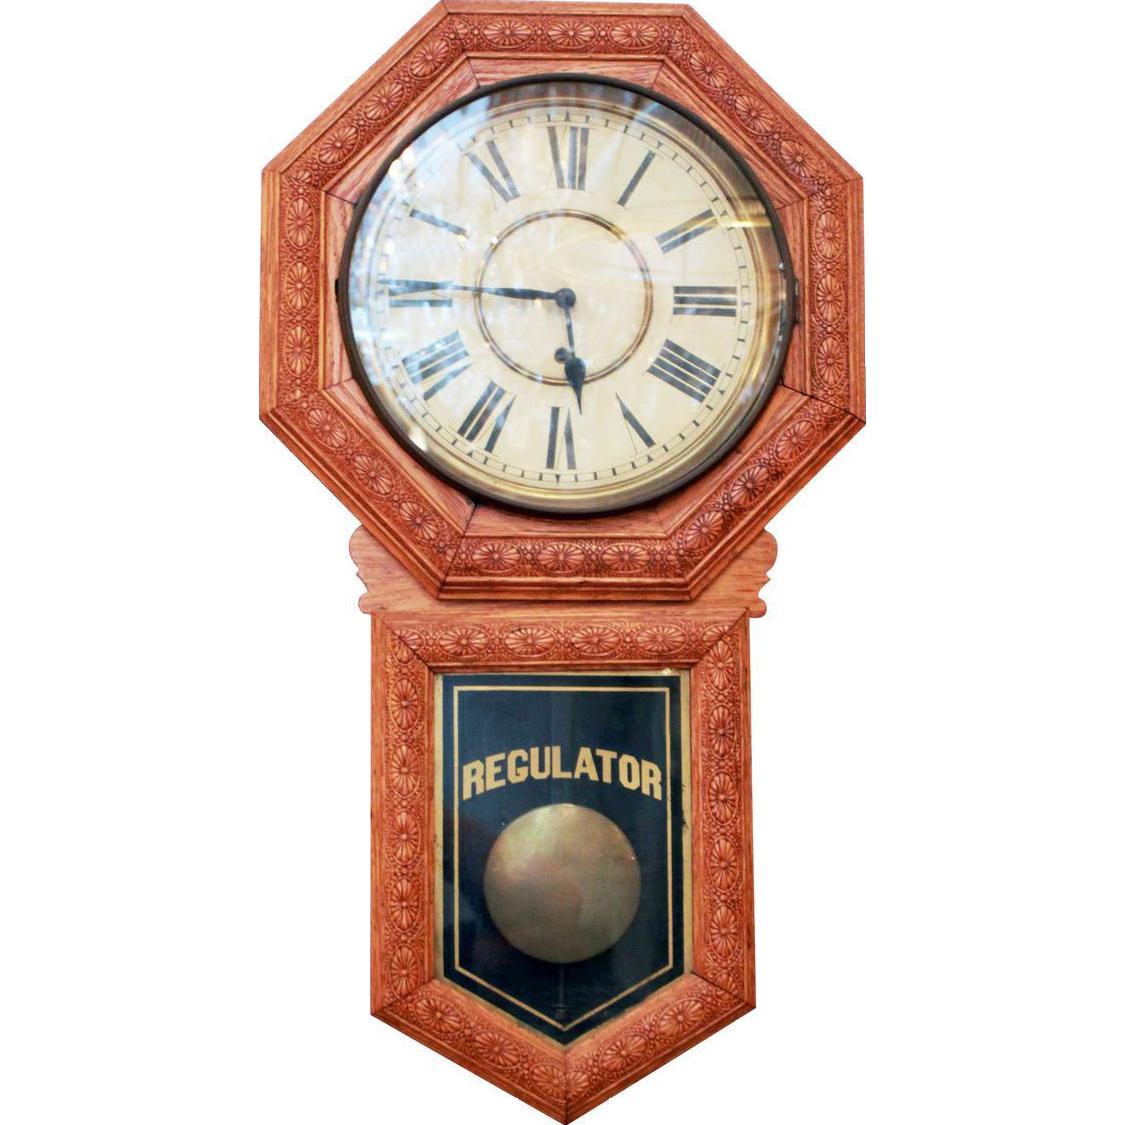 Vintage Regulator wall mount clock